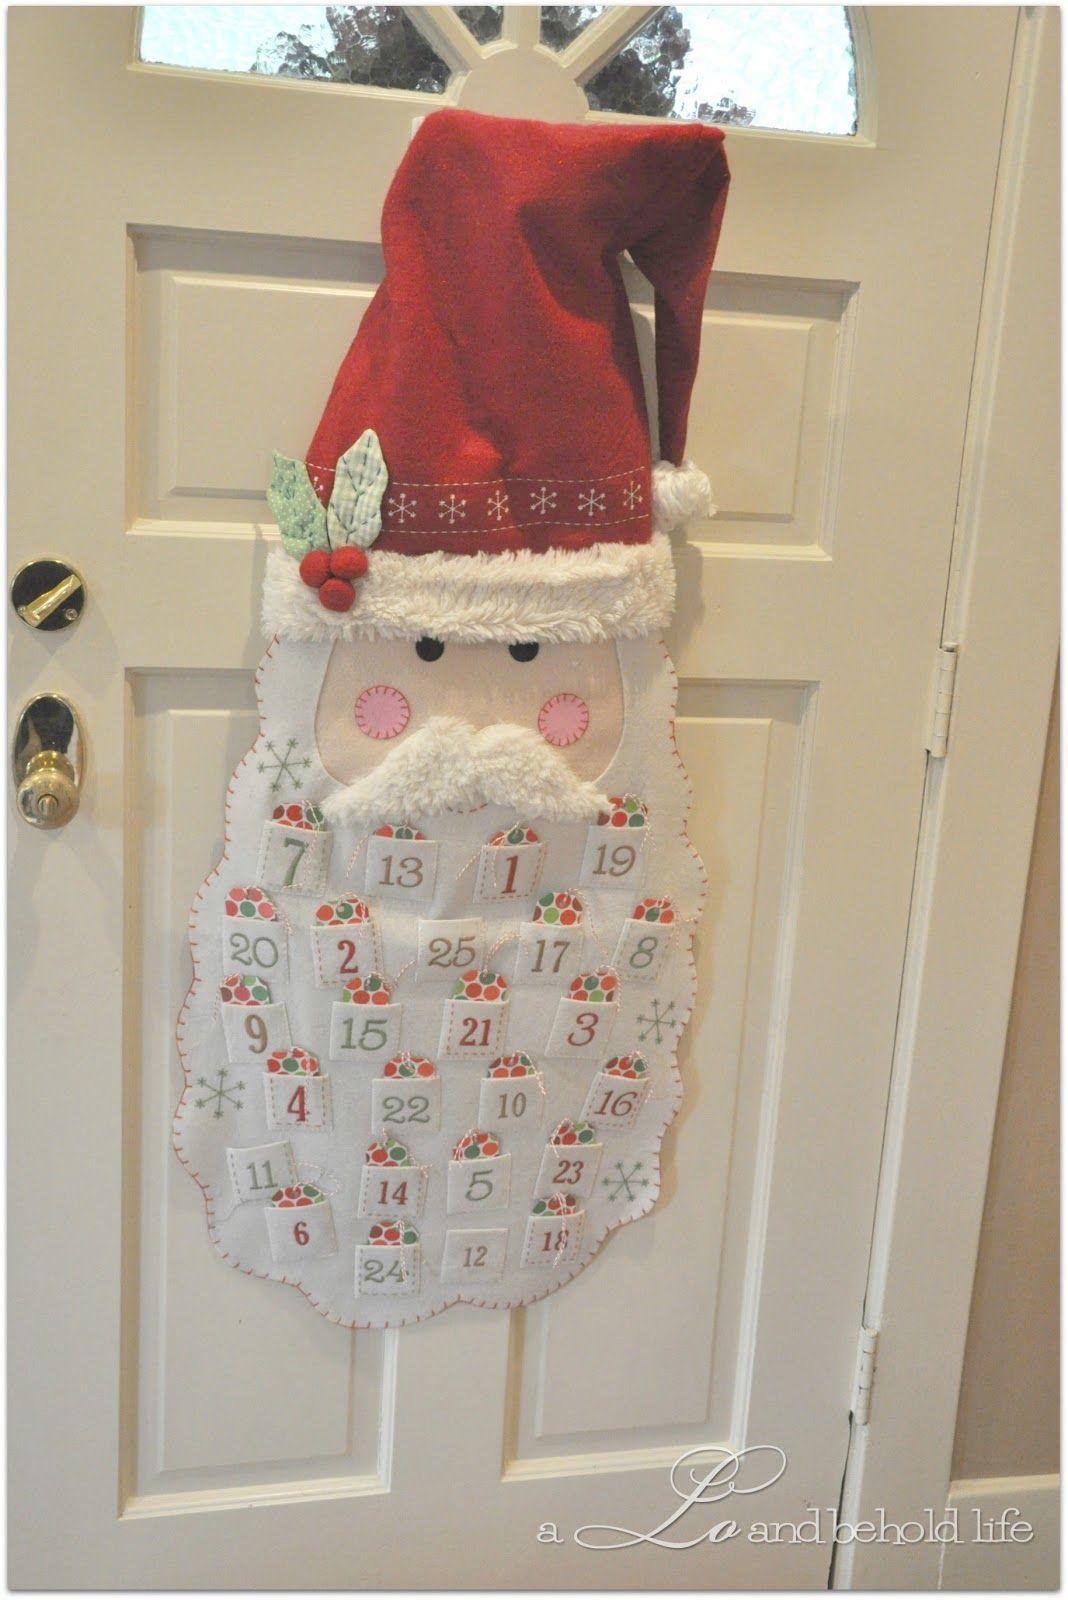 Santa Advent Calendar.  a LO and behold life